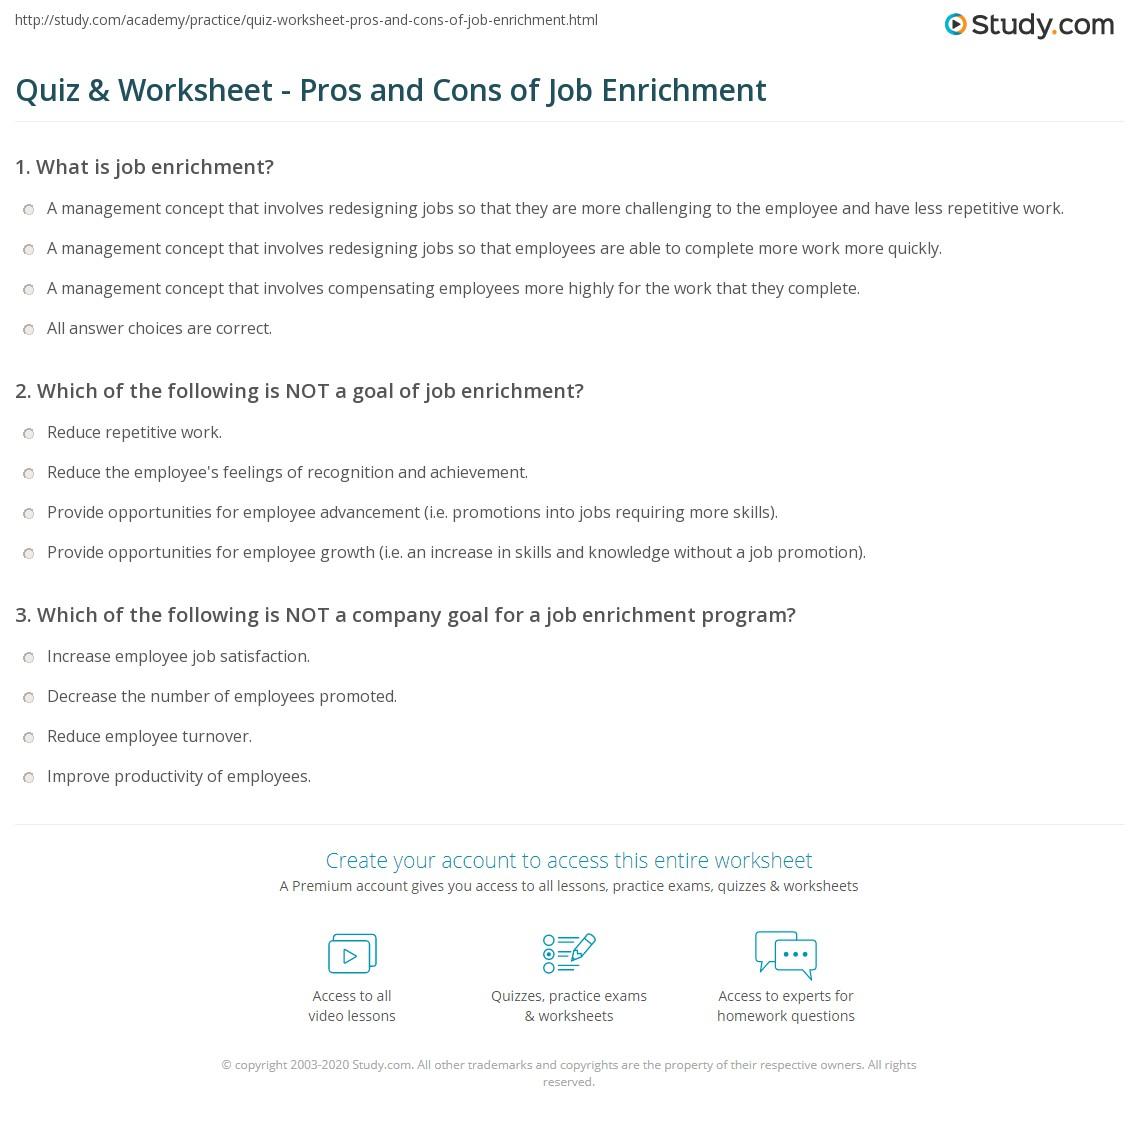 quiz worksheet pros and cons of job enrichment. Black Bedroom Furniture Sets. Home Design Ideas